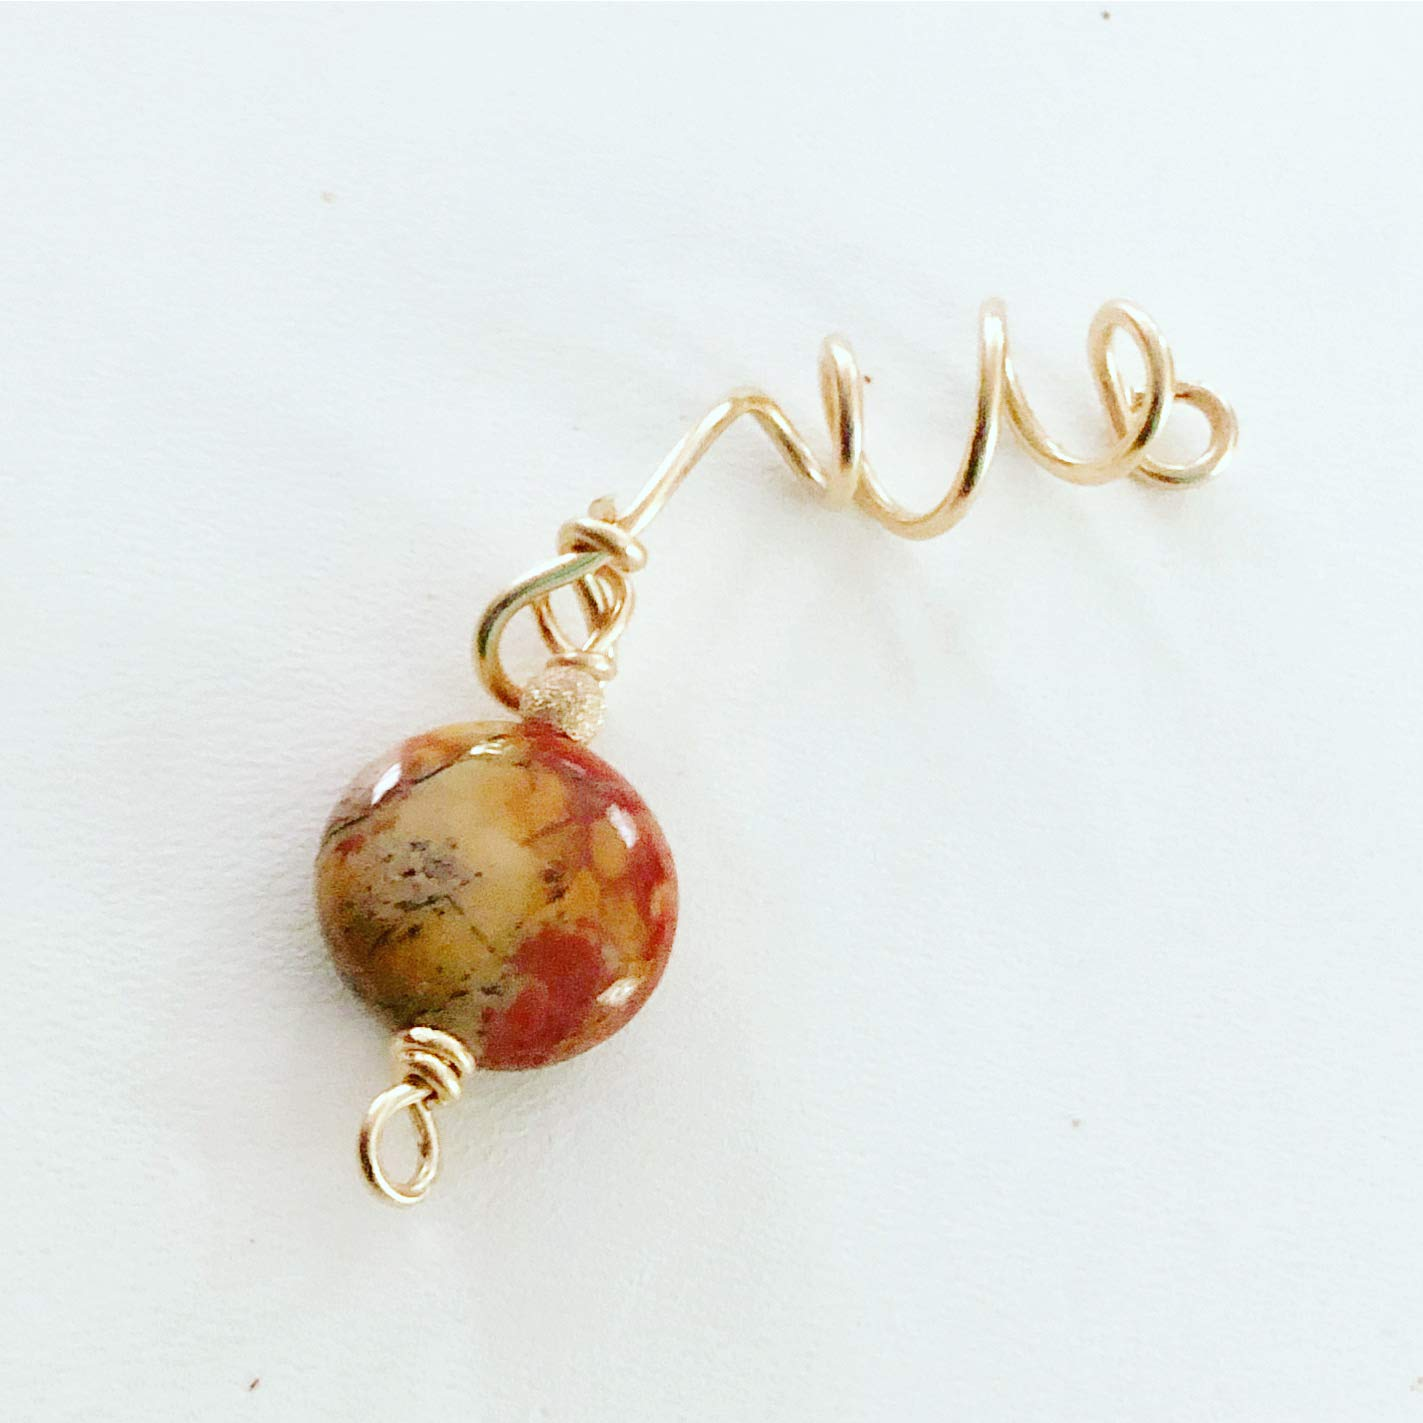 Loc Jewelry Birds Eye Rhyolite 14K Gold Filled Adjustable Dread Bead Jewel Charm Dreadlock Accessories Gemstone Schmuck